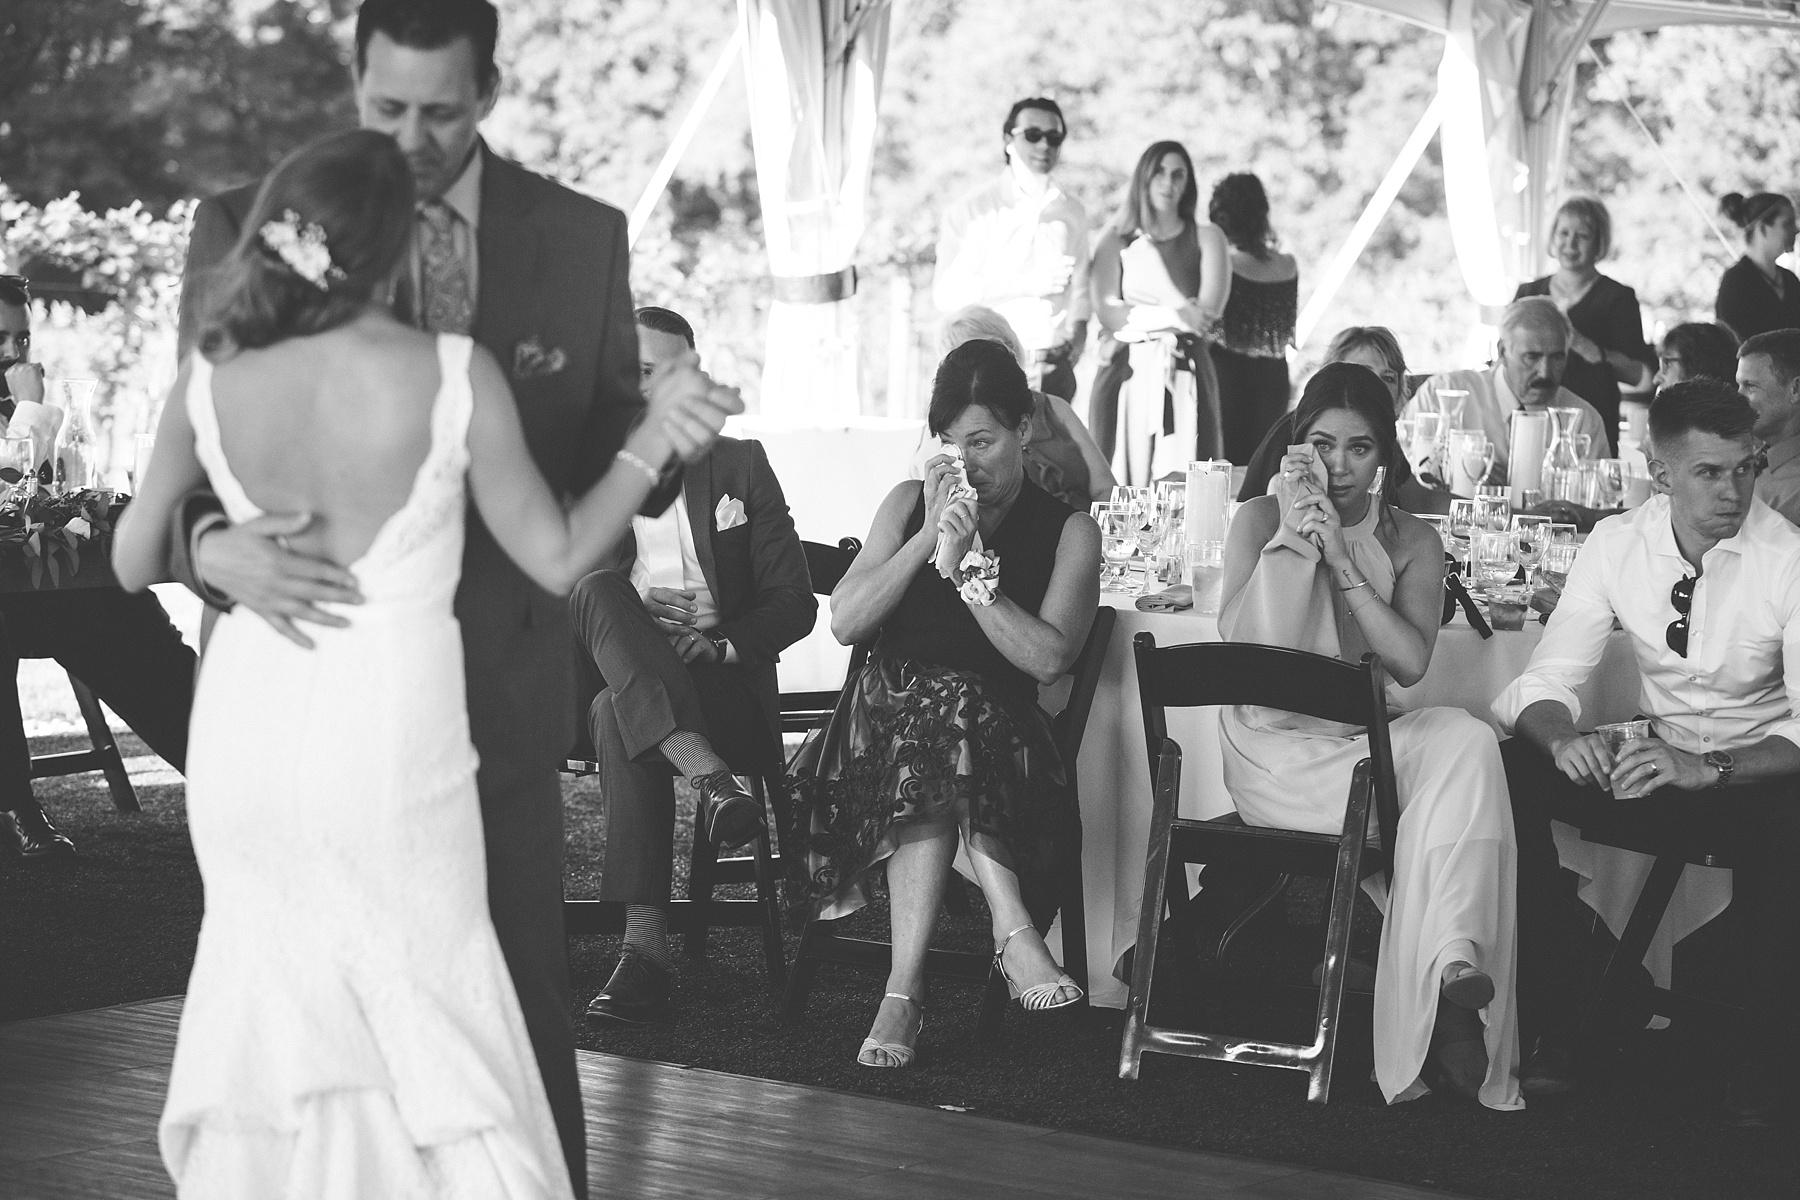 Brandon_Shafer_Photography_Kara_Doug_12_corners_Wedding_Benton_Harbor_0067.jpg